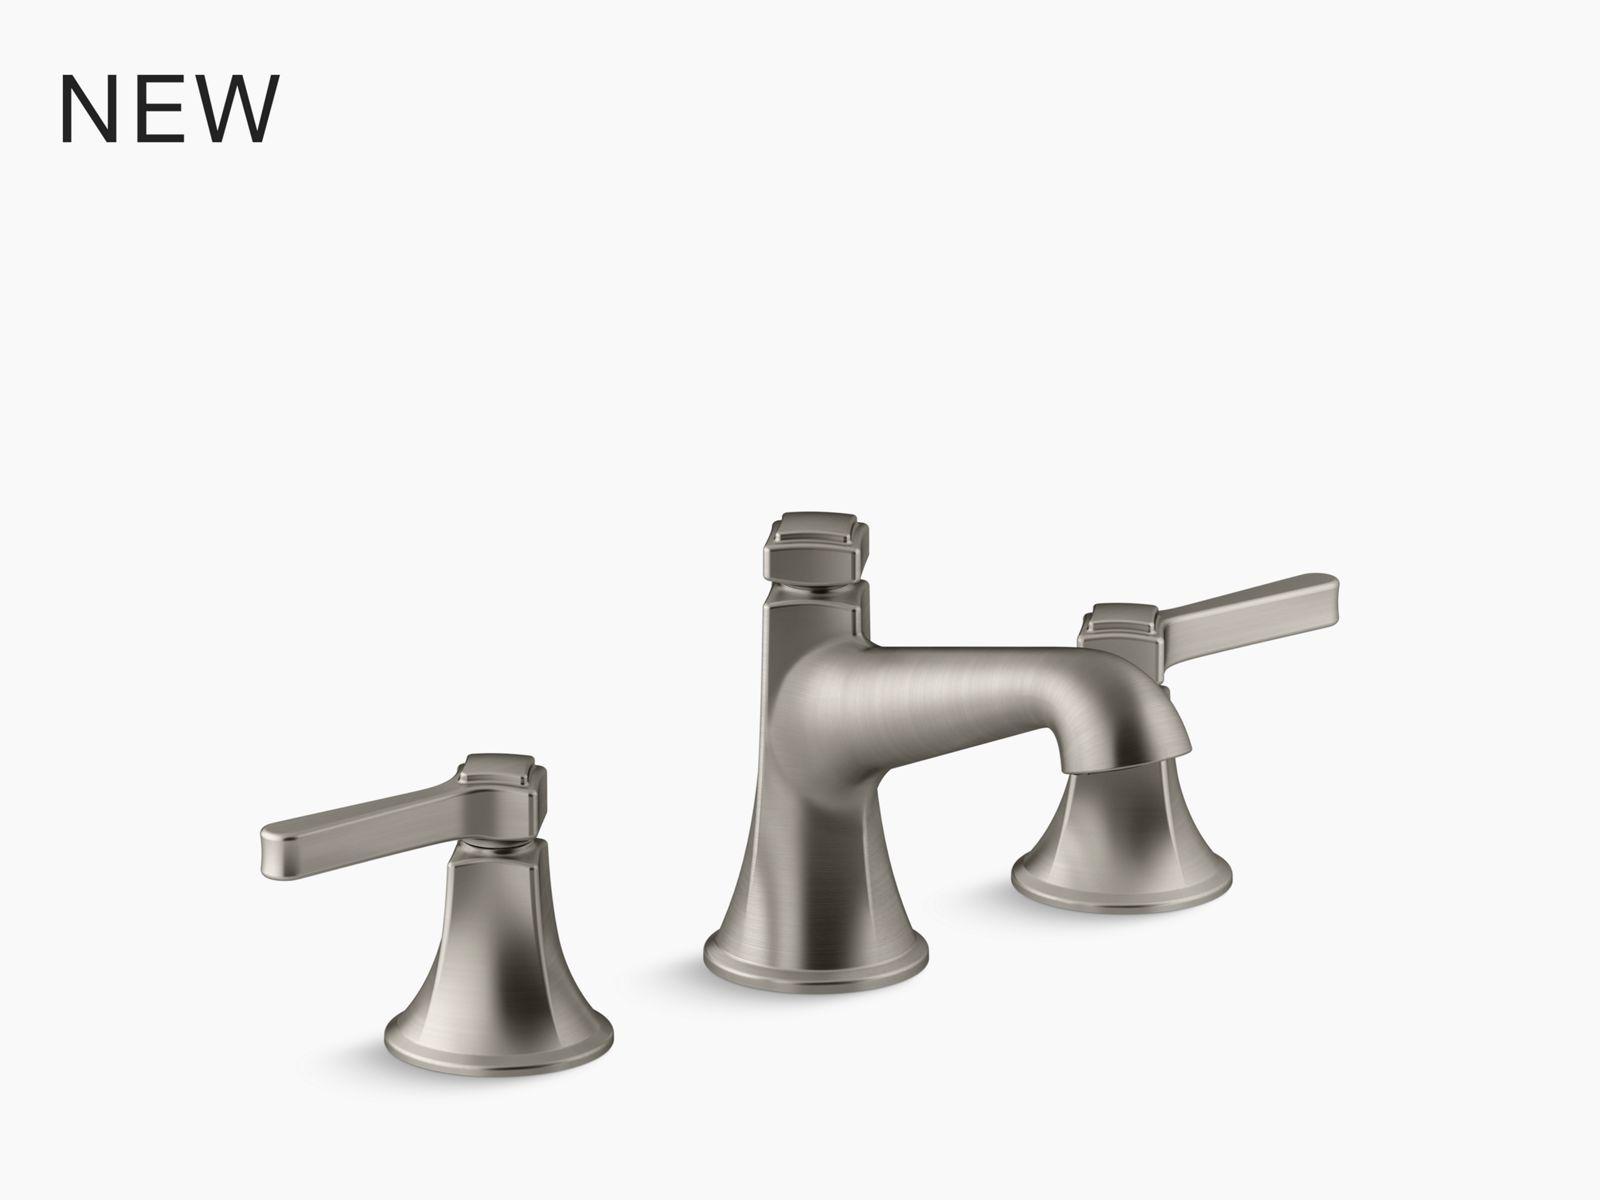 clearflo brass toe tap bath drain